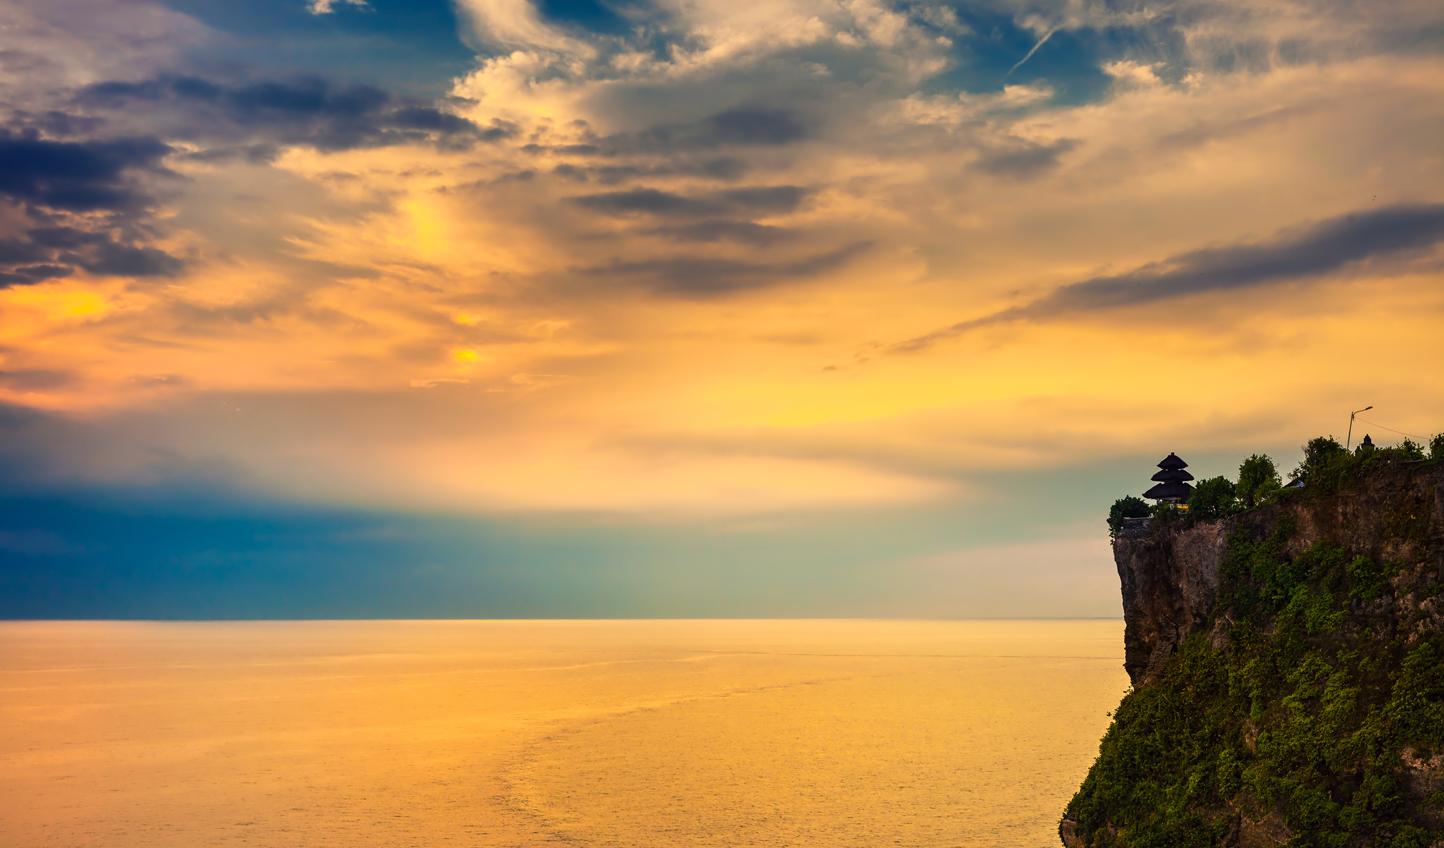 Watch the sunset over Uluwatu Temple